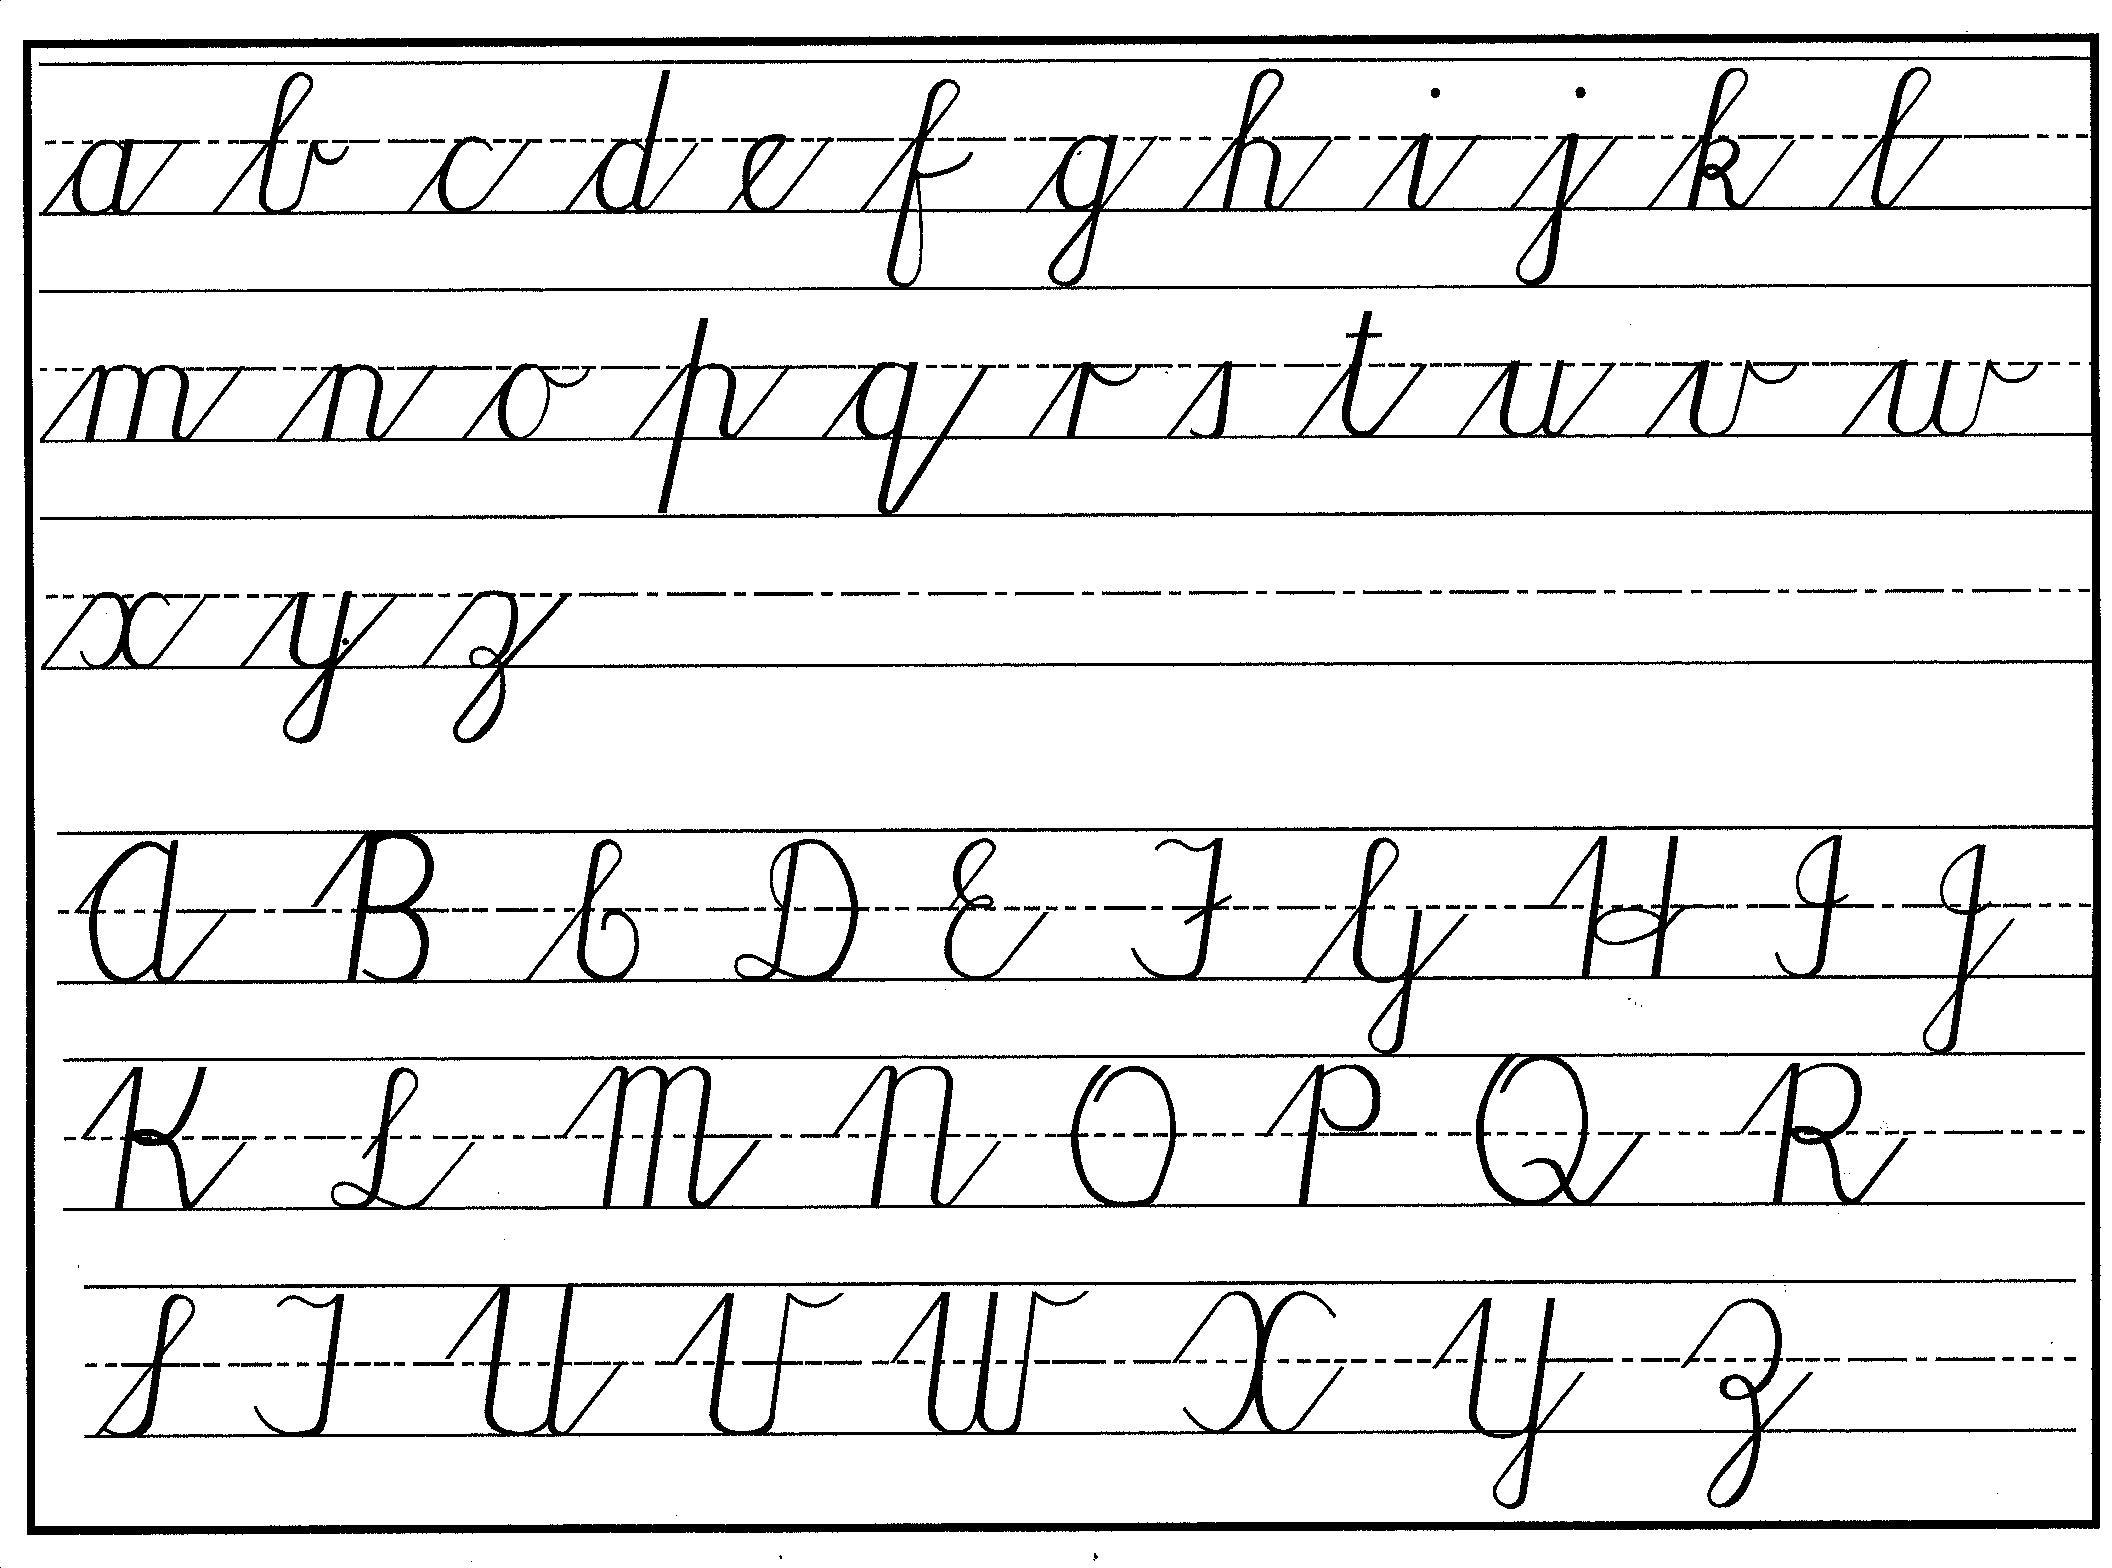 Worksheet ~ Cursive Alphabet For Kids Writing Video Games